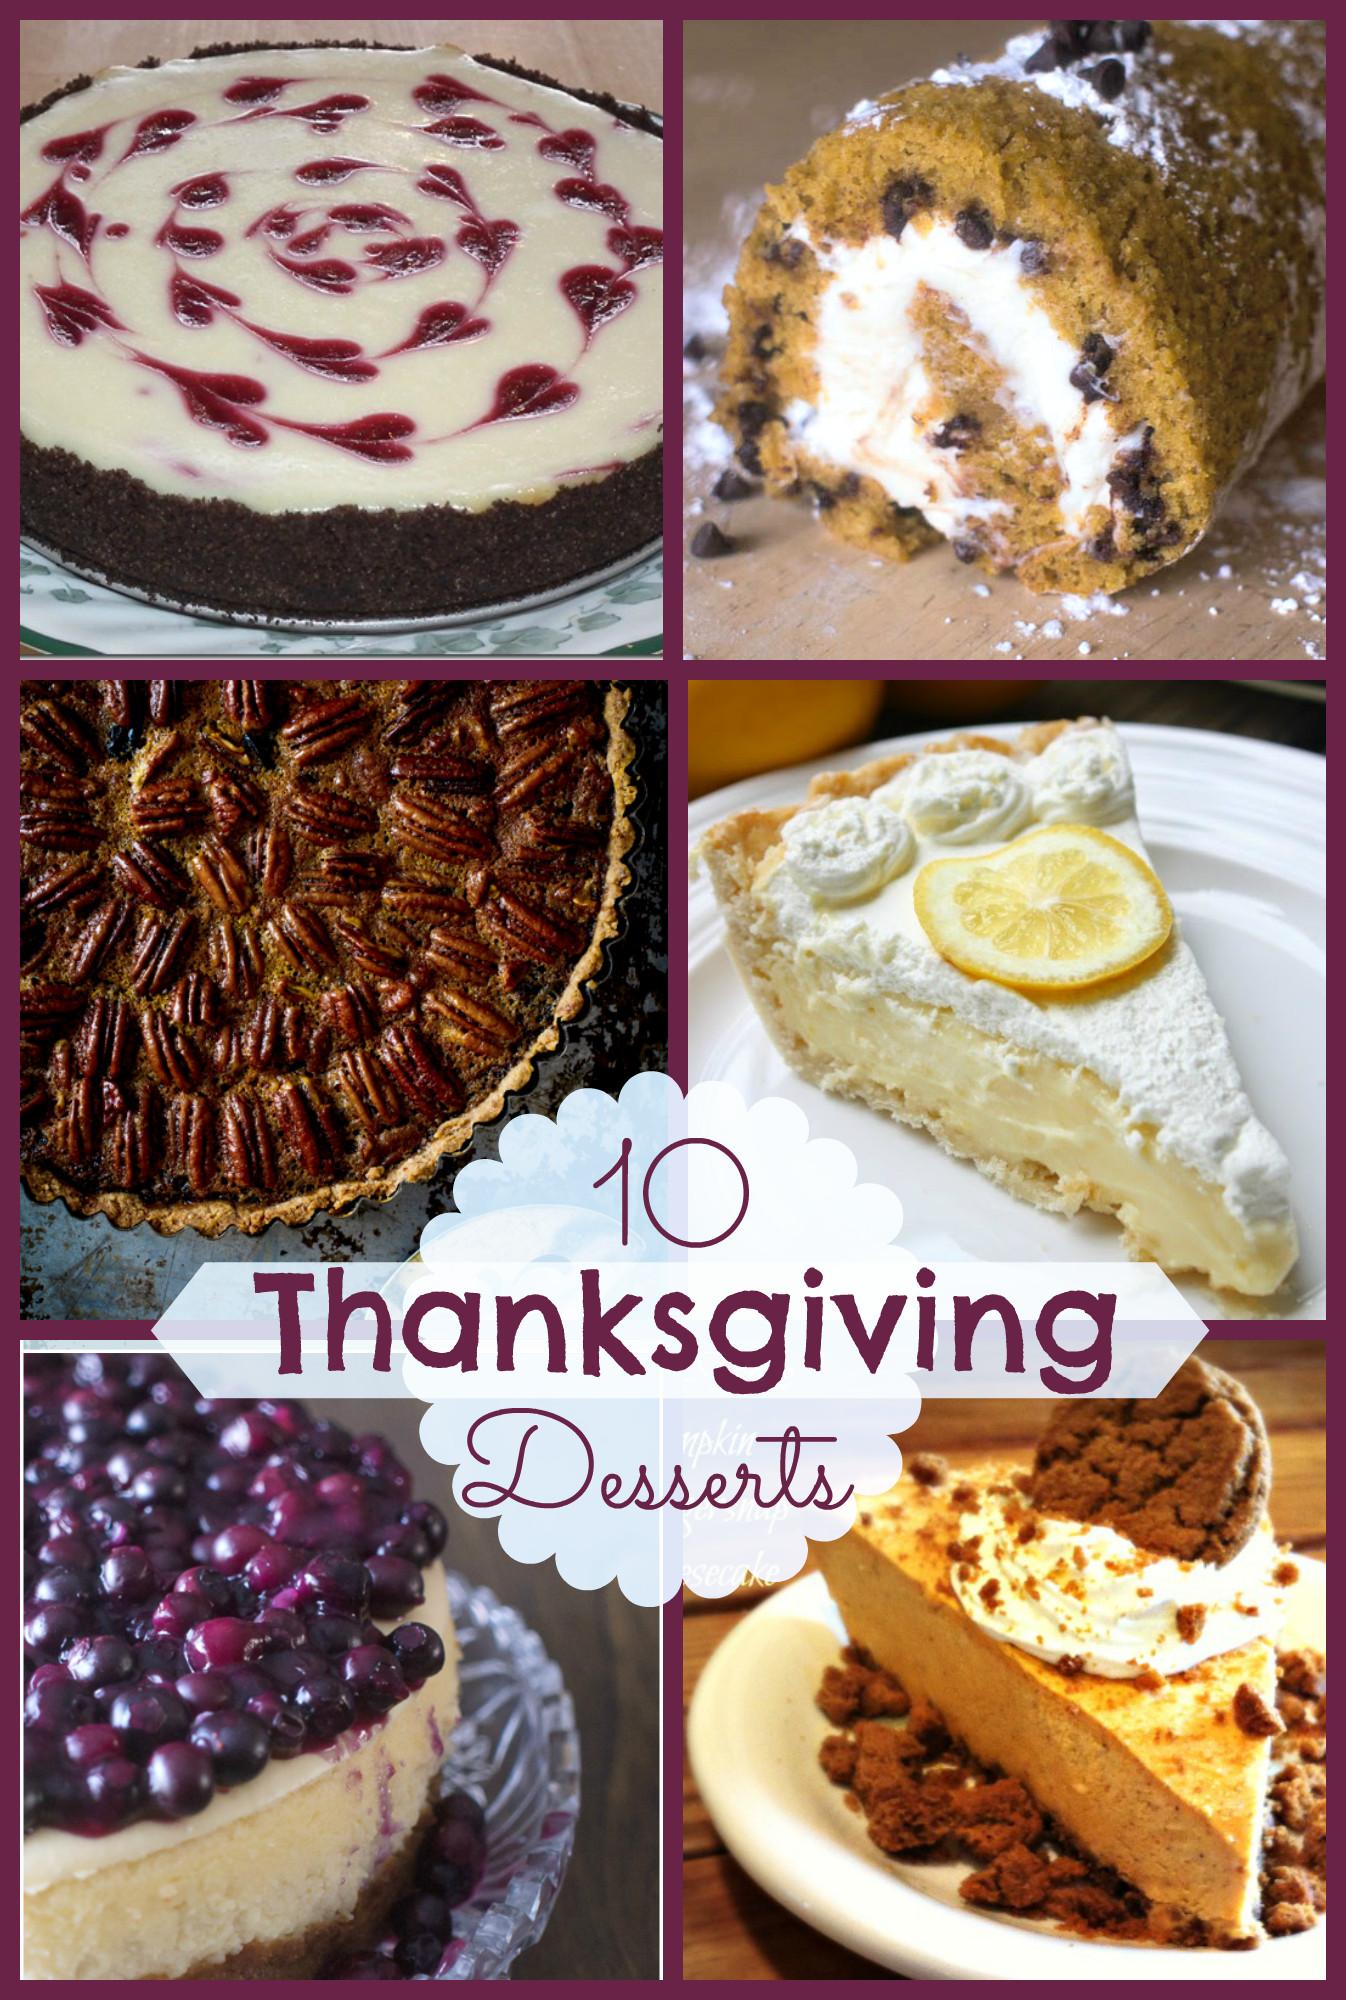 Ideas For Thanksgiving Desserts  10 Fabulous Thanksgiving Desserts